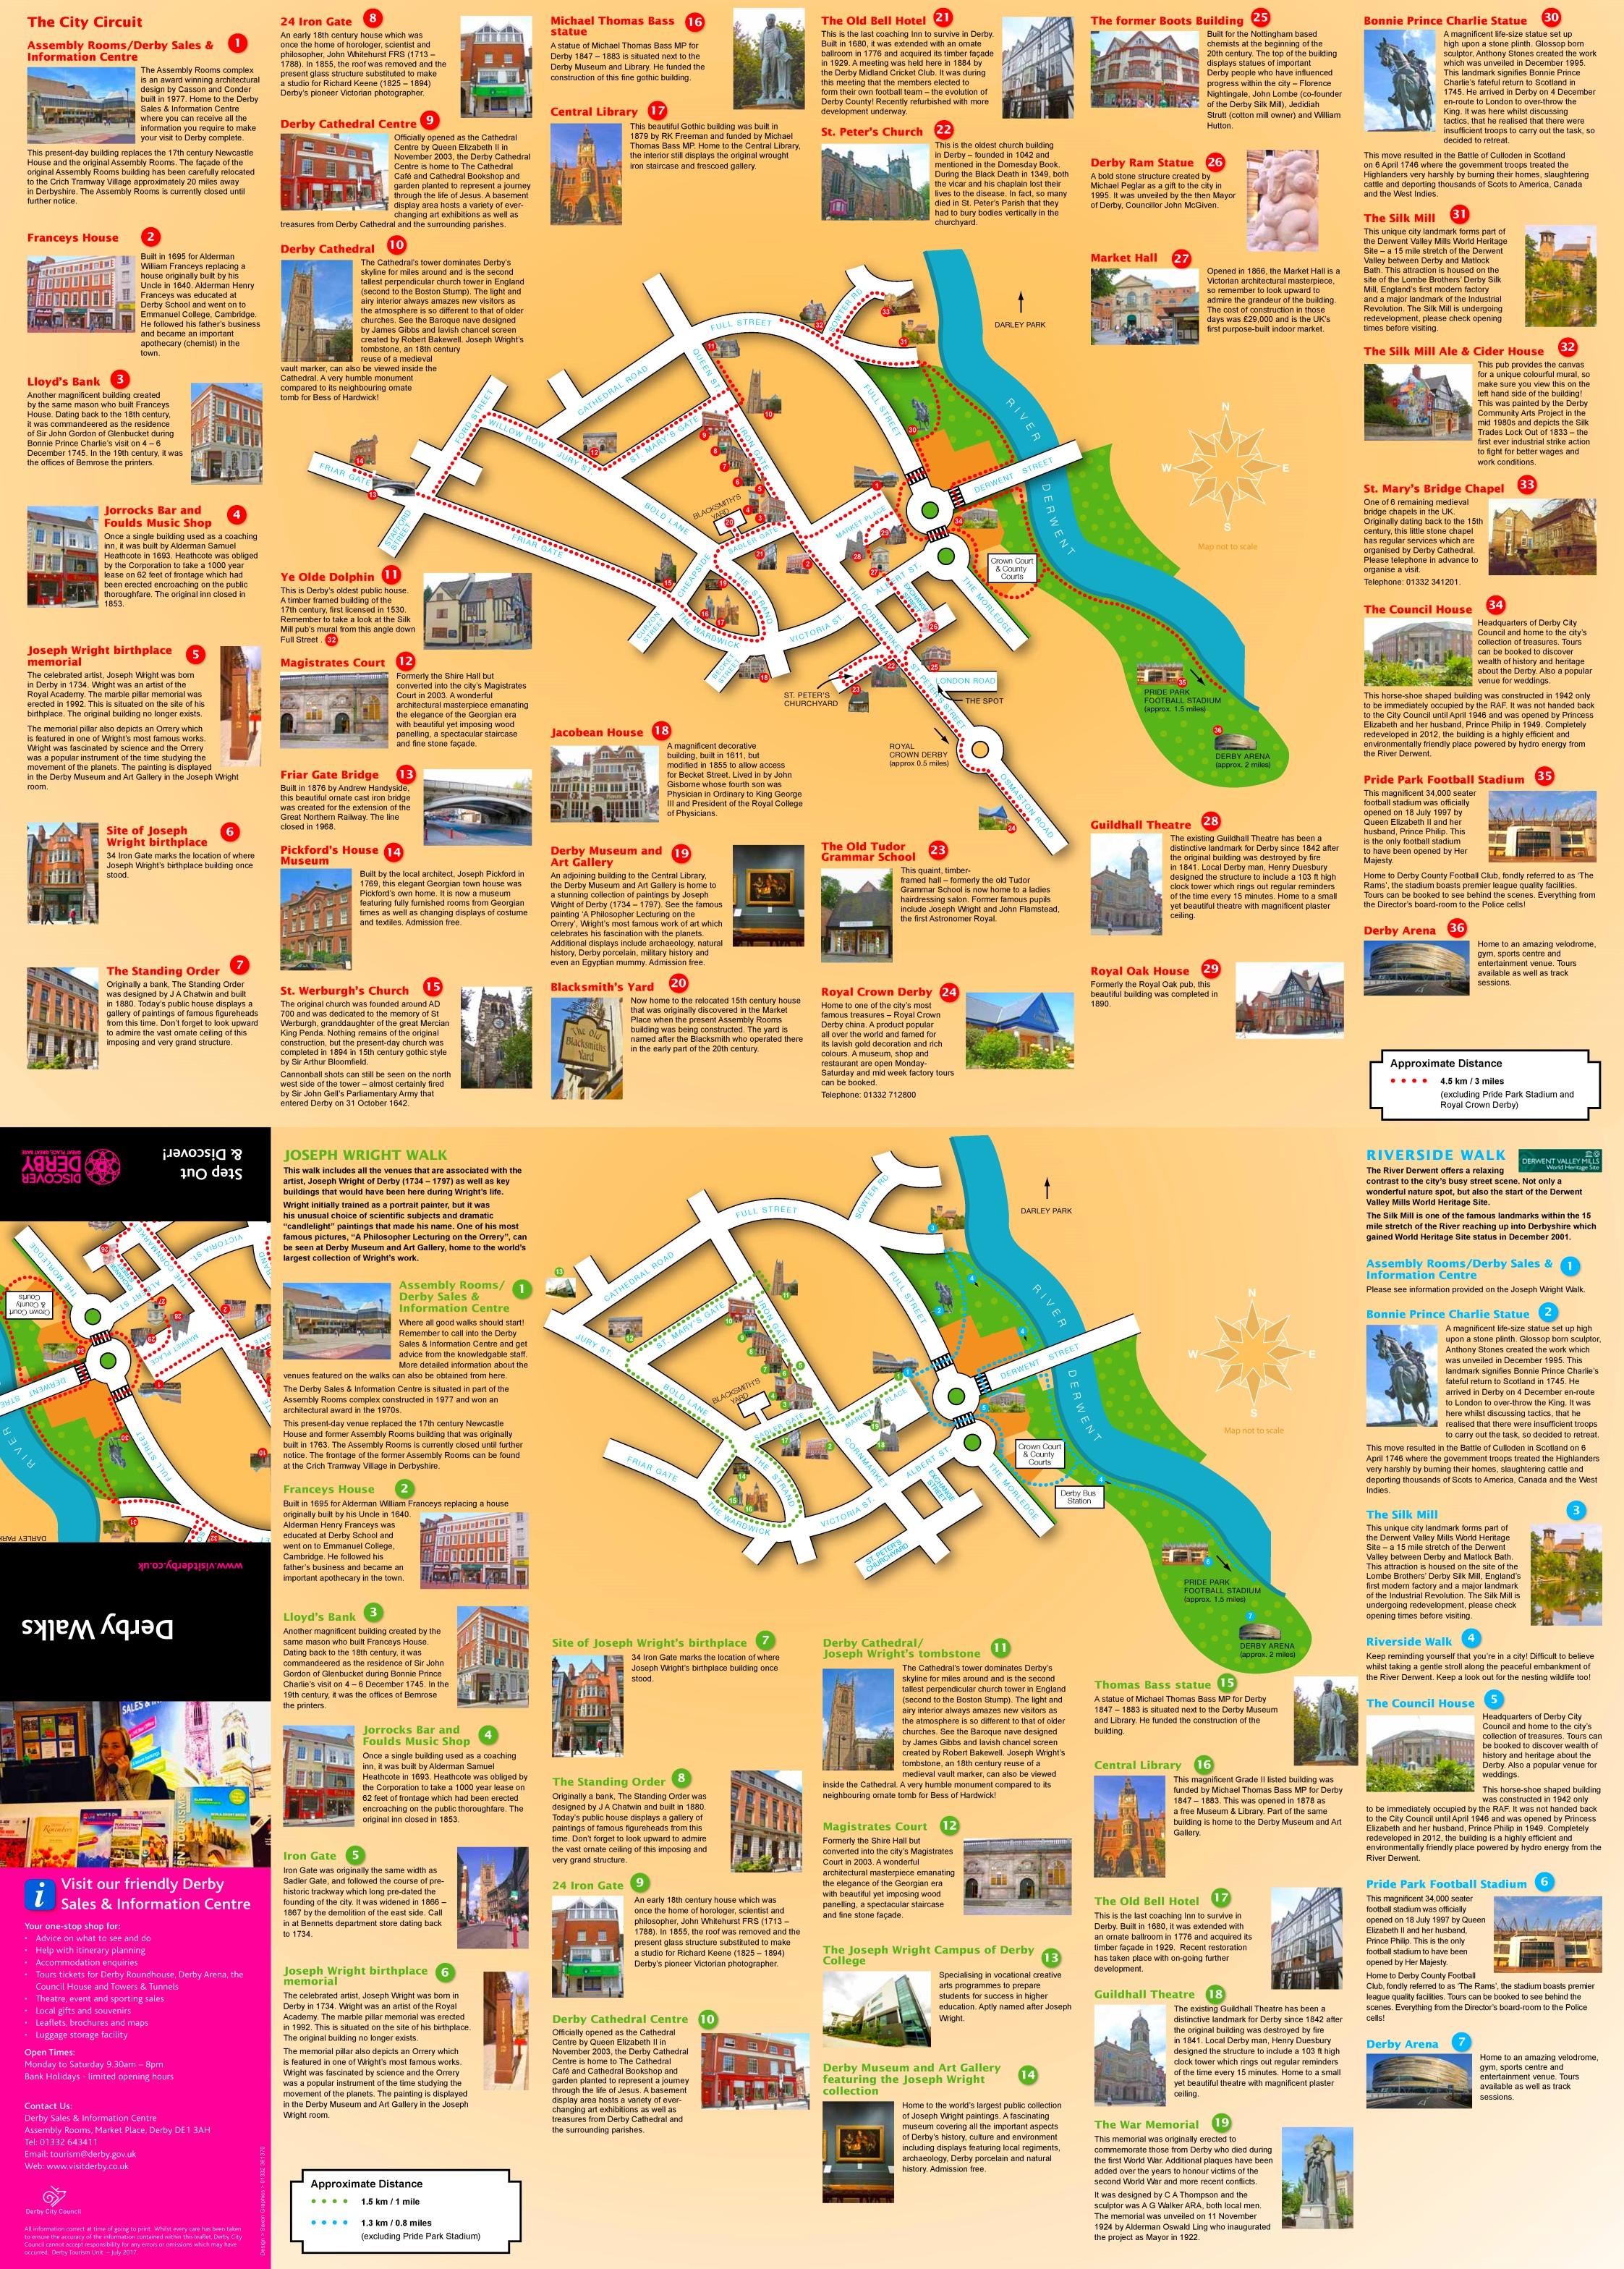 Derby walks map